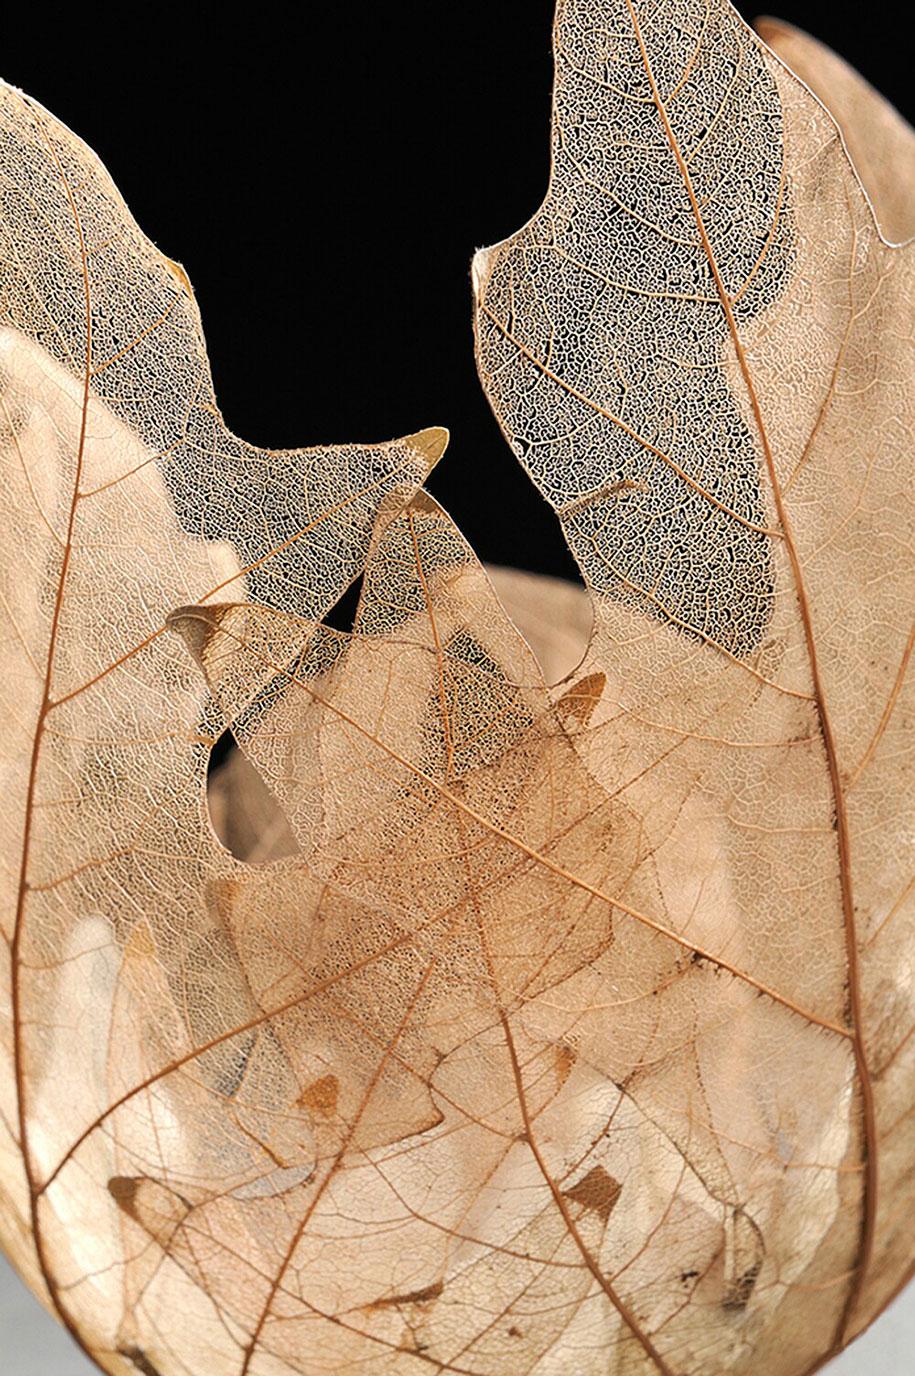 art-leaf-bowl-kay-sekimachi-3-2